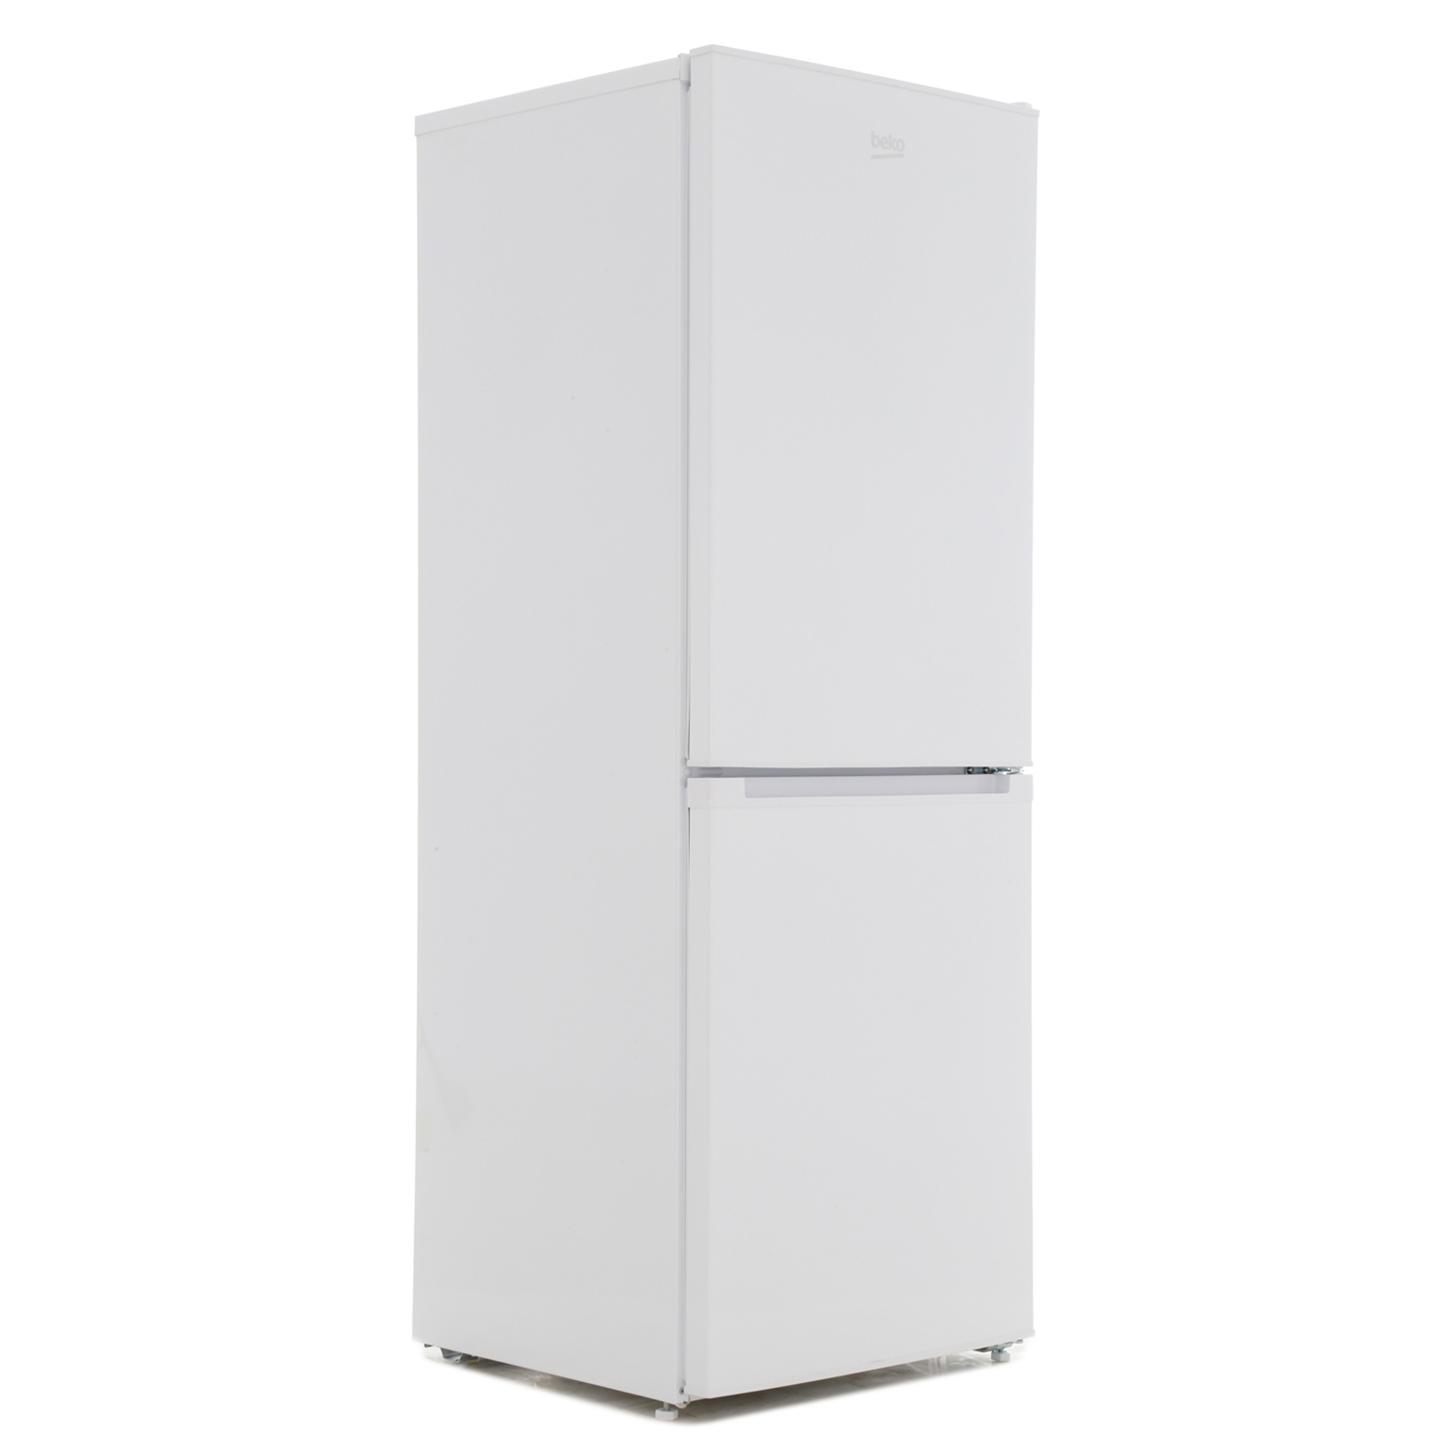 Beko CCFM1552W Frost Free Fridge Freezer